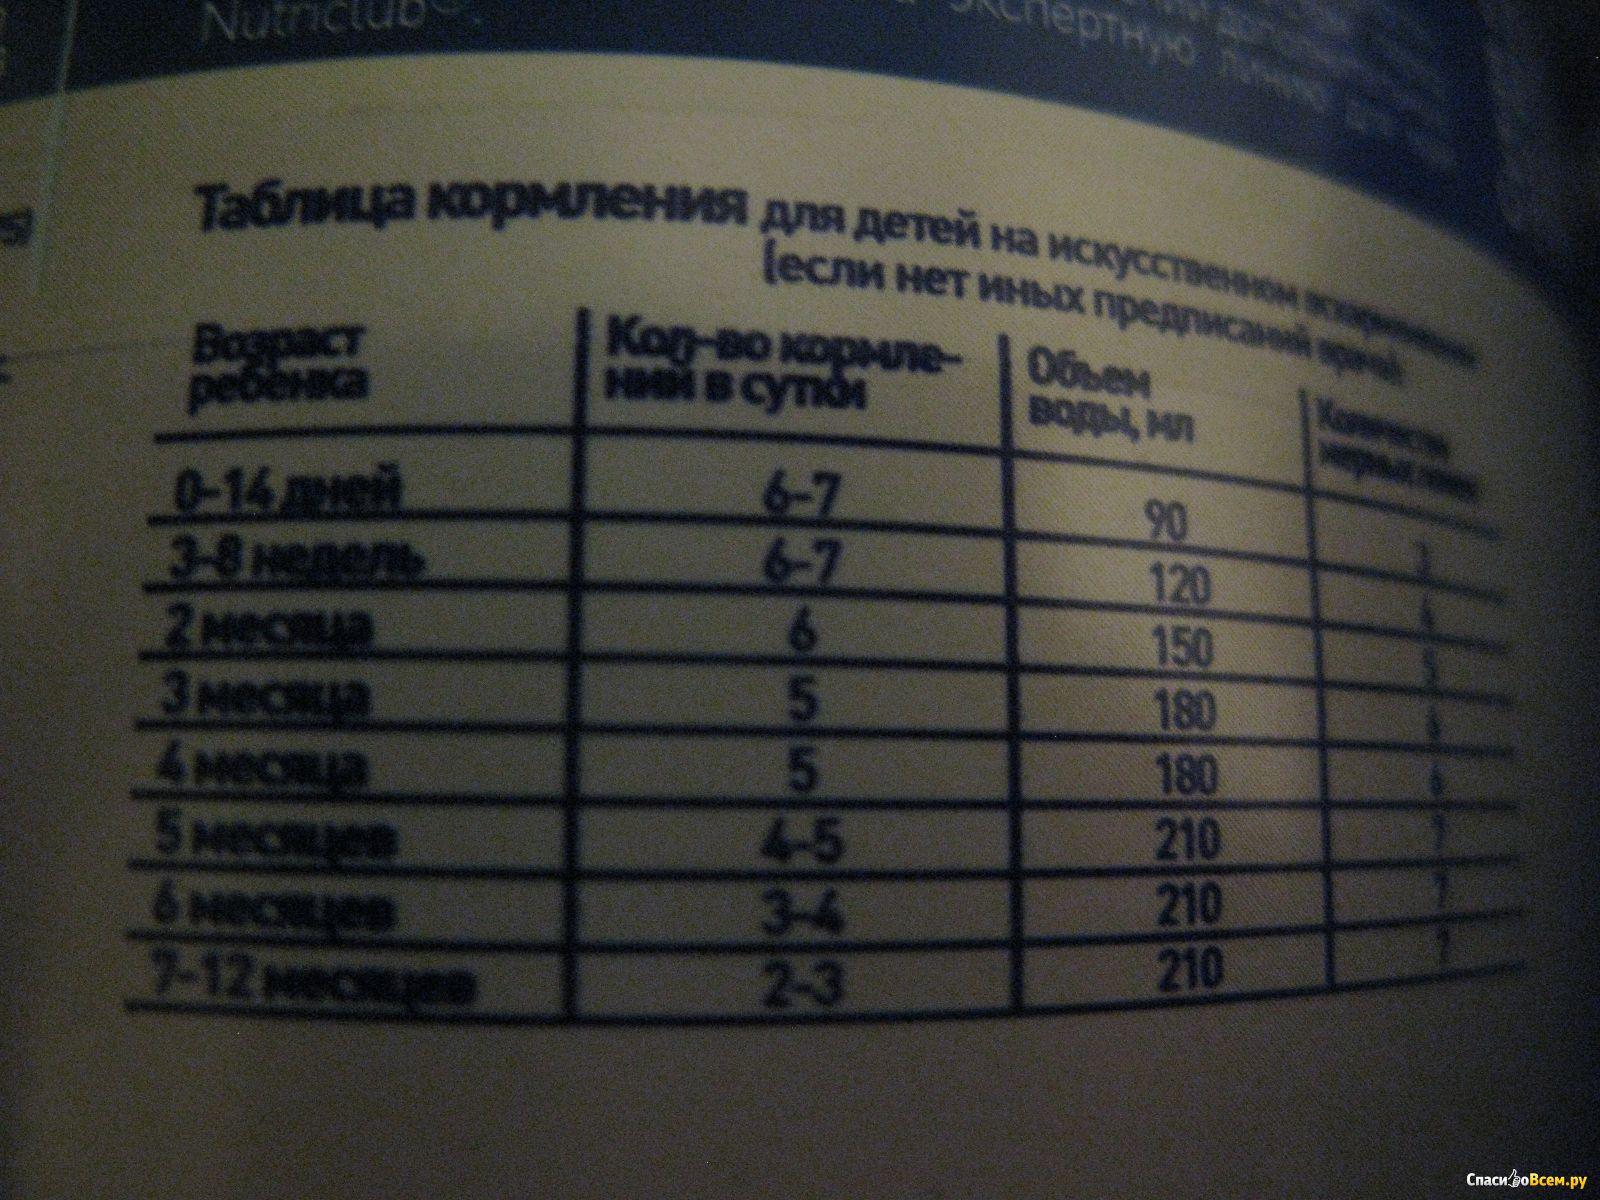 пепти гастро лучше чем пепти аллергия